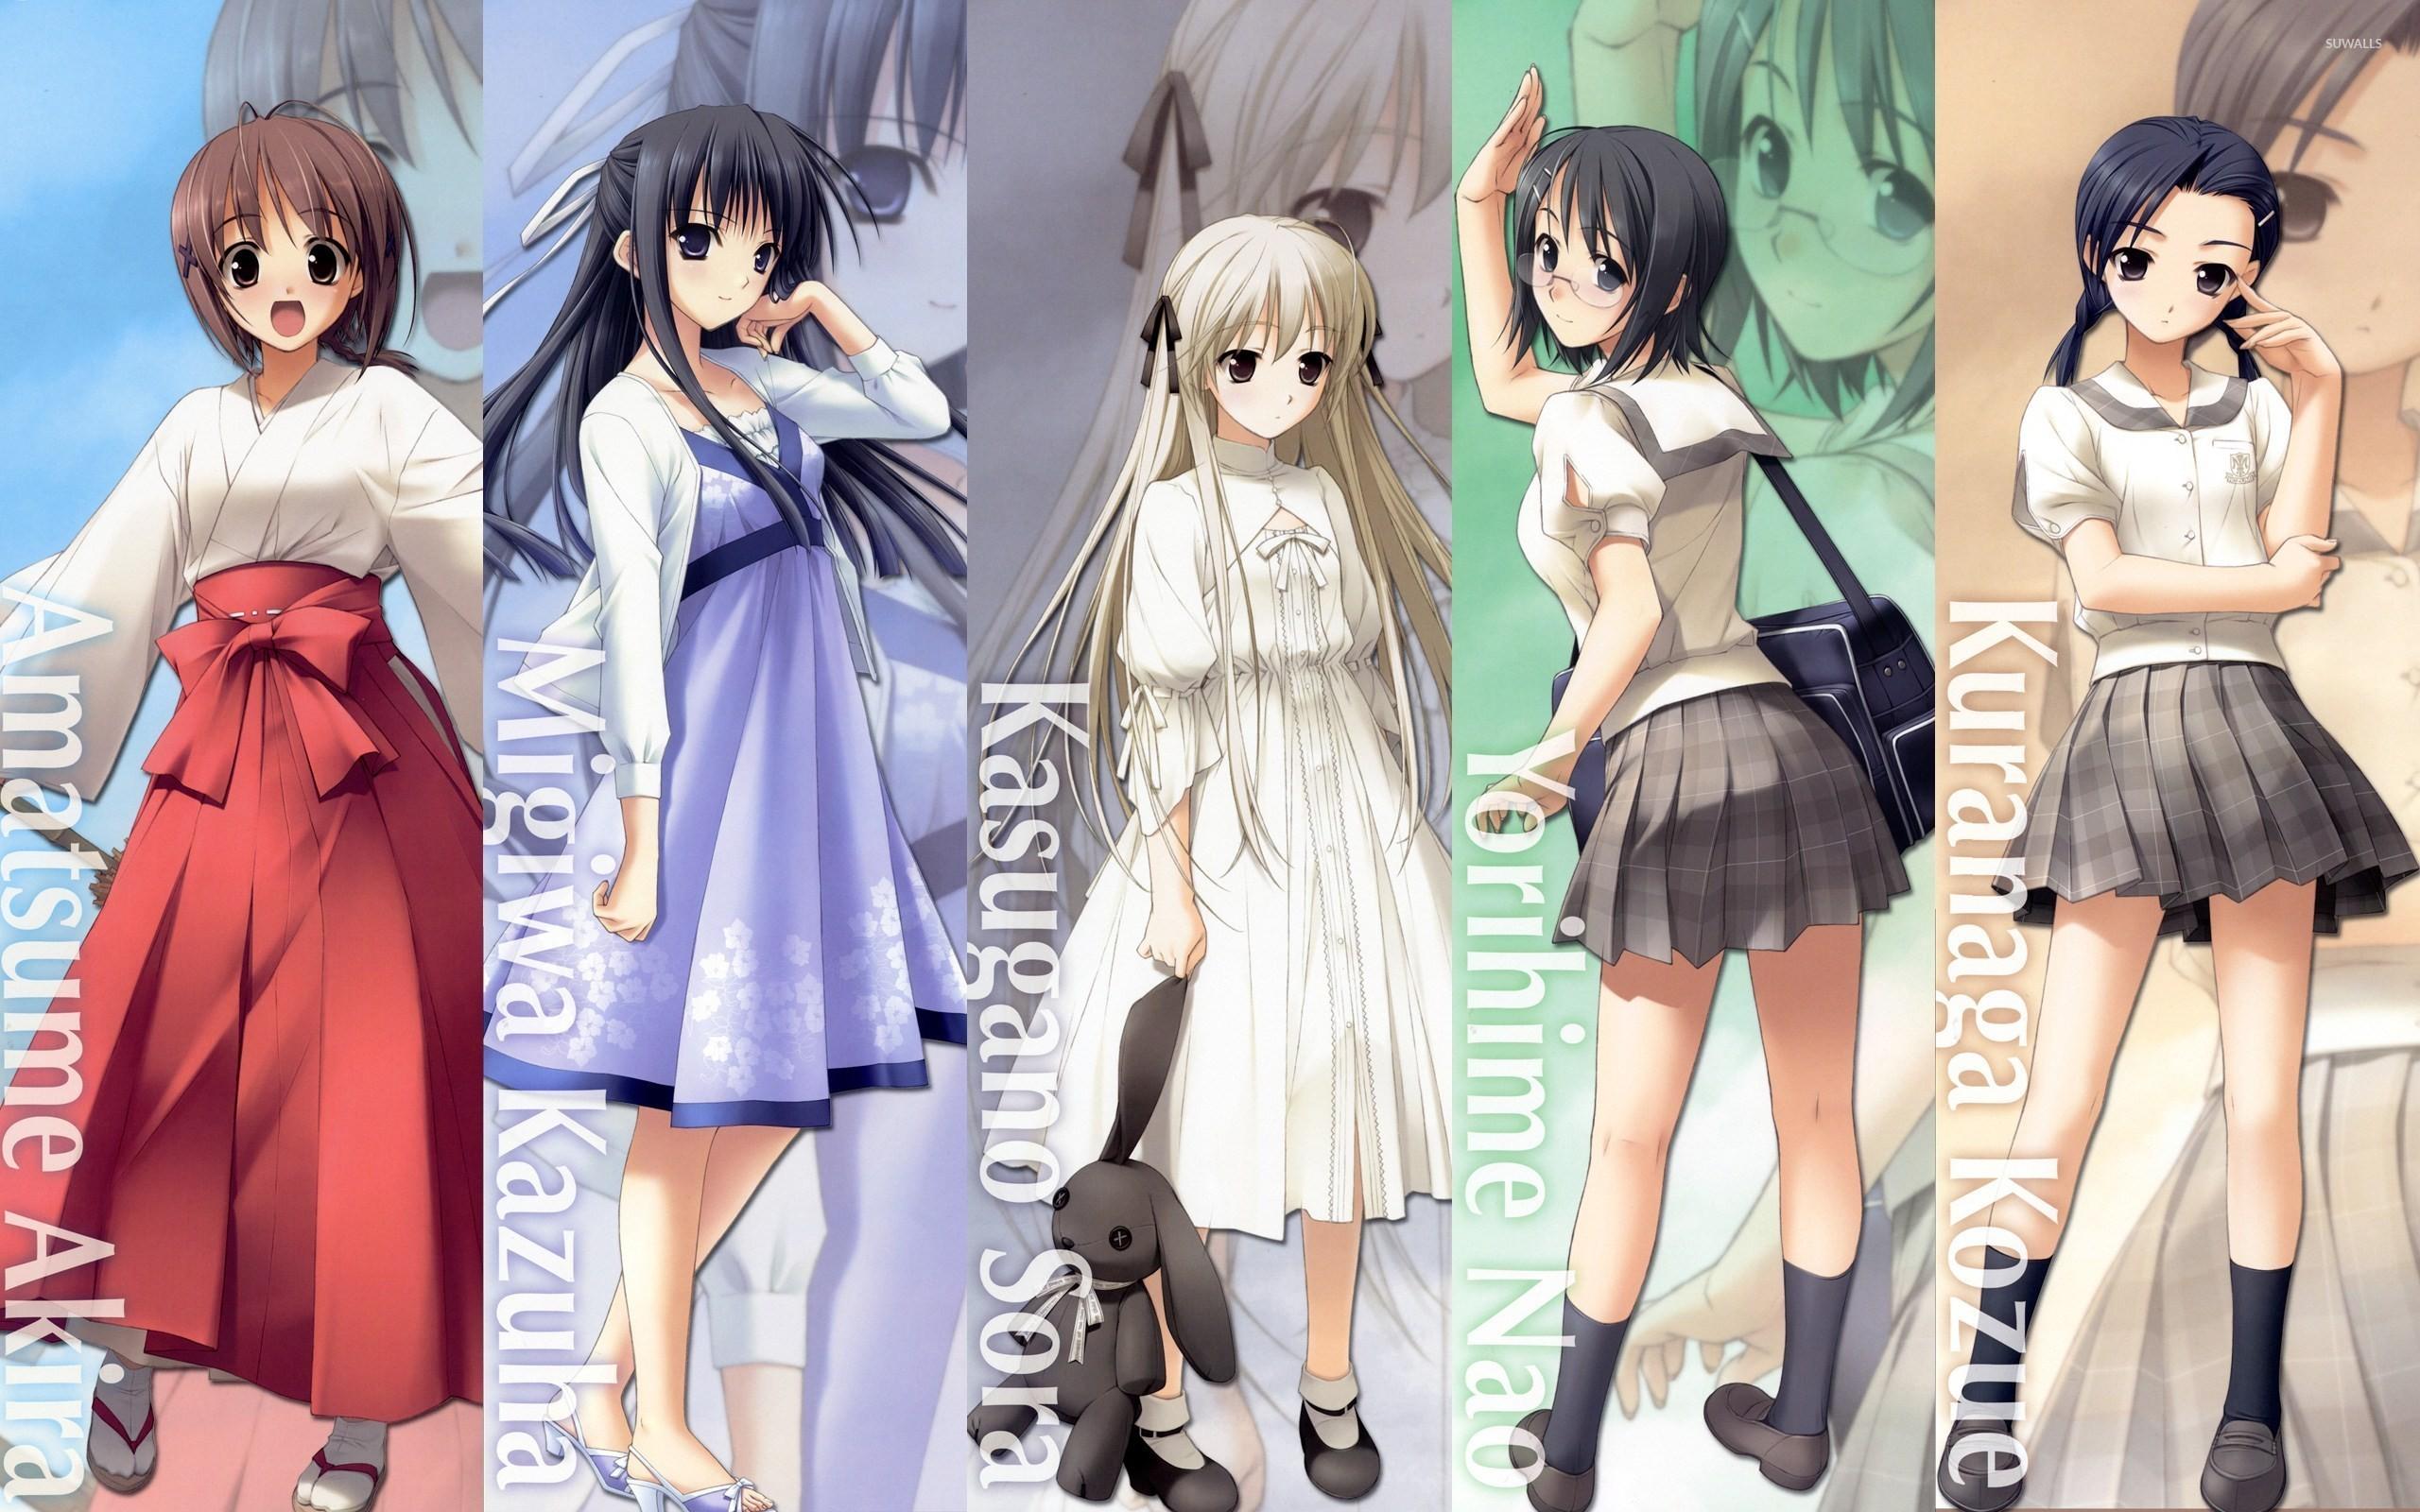 Yosuga No Sora HD wallpapers, Desktop wallpaper - most viewed